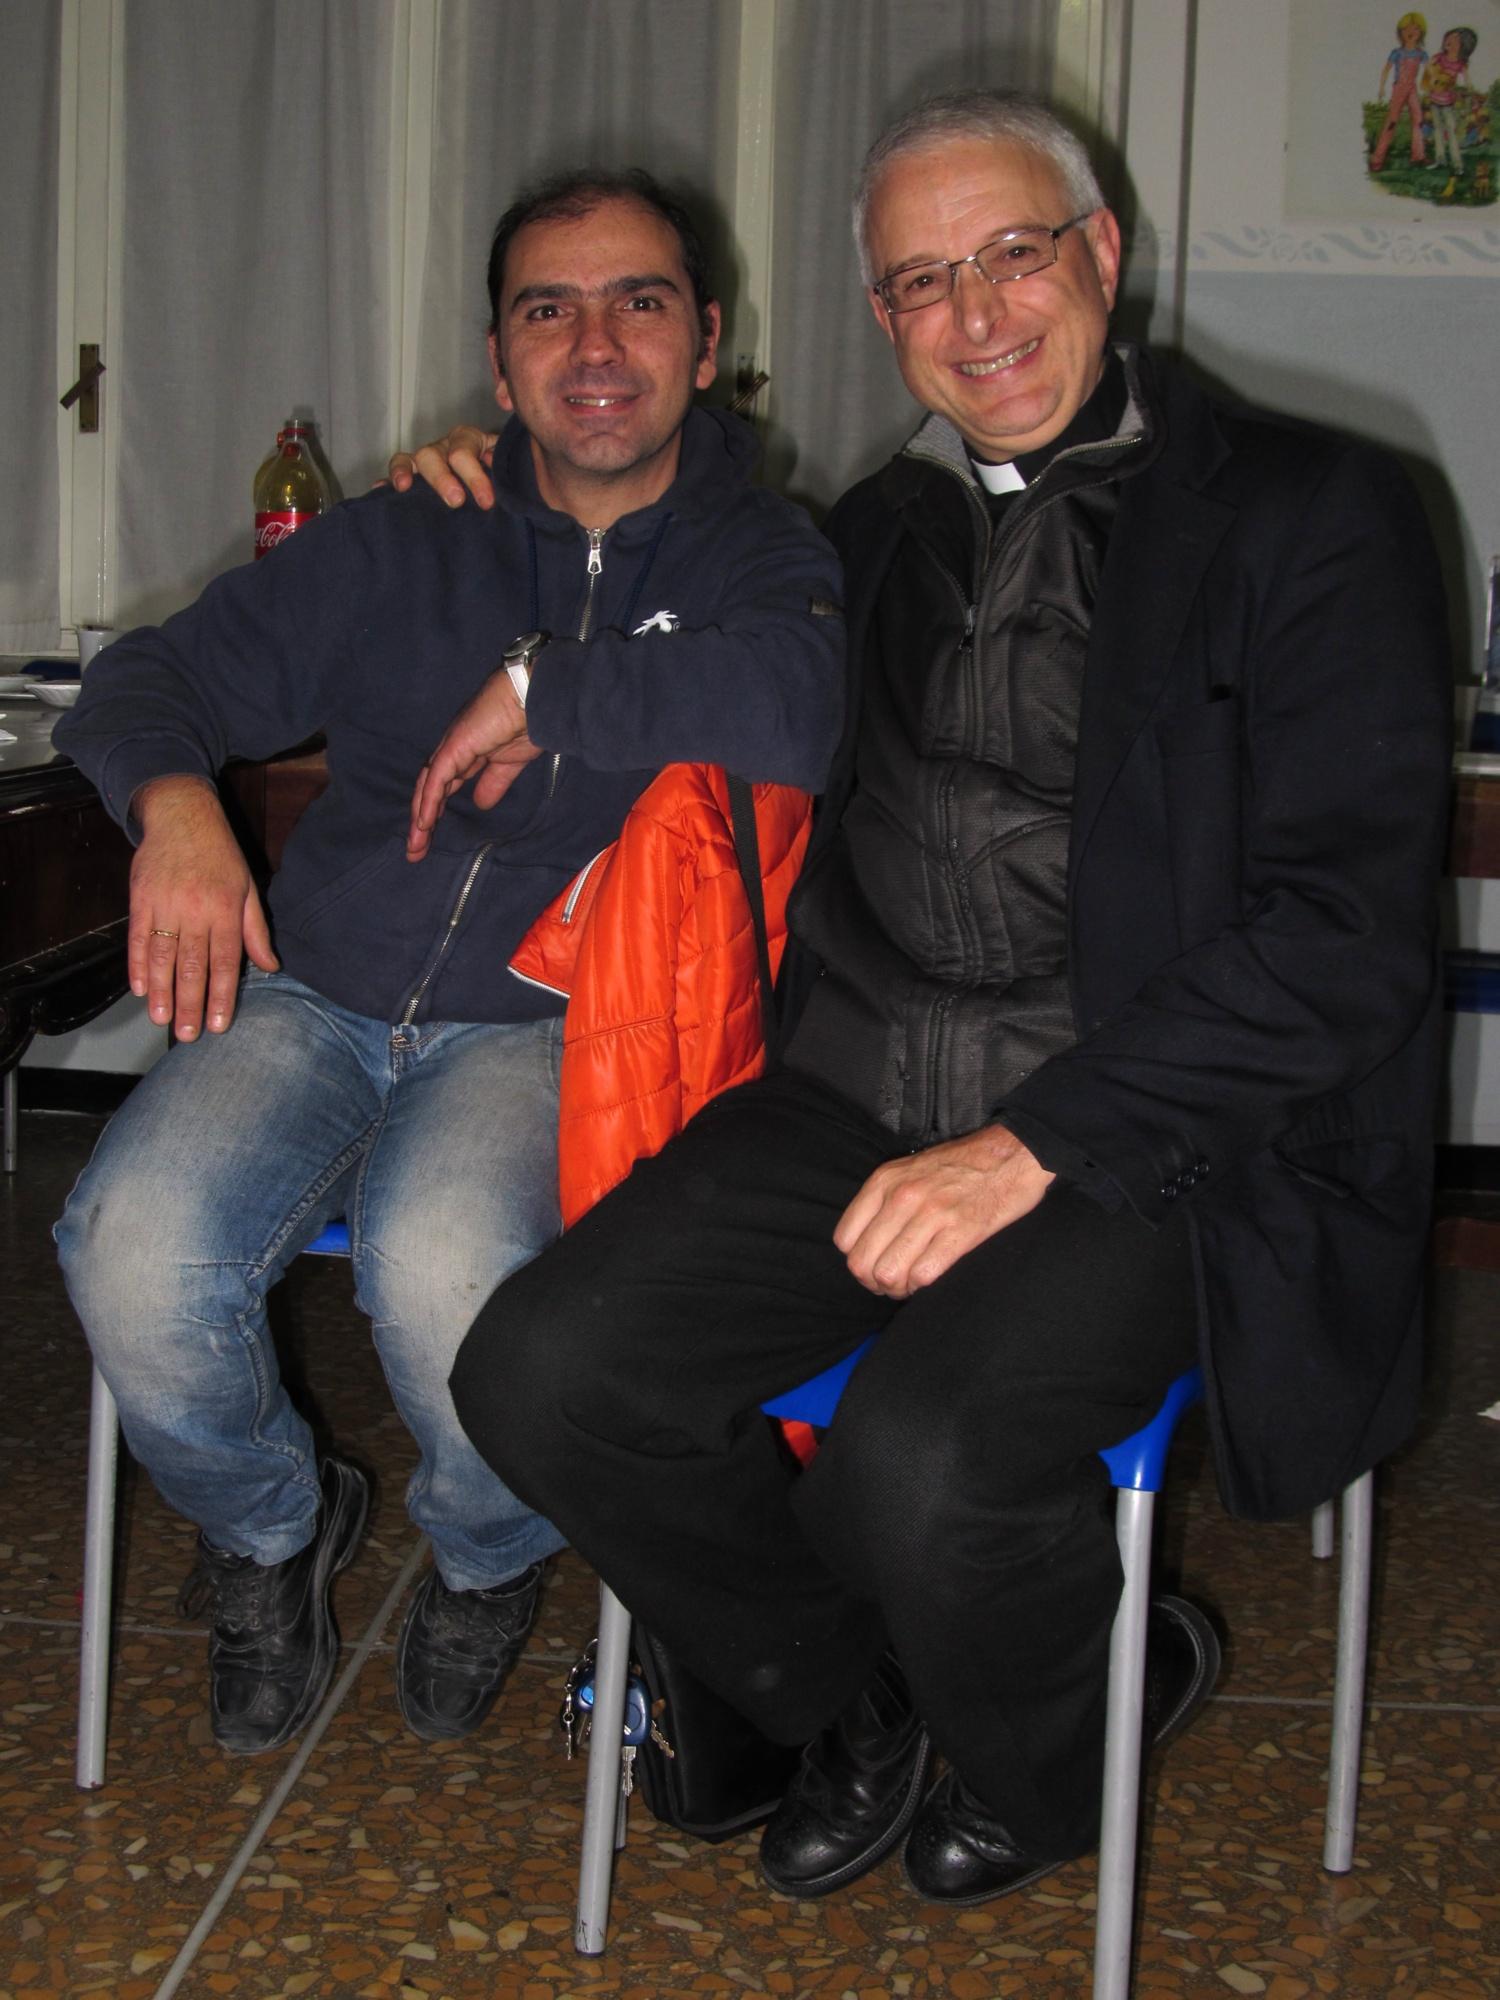 serata-acr-2014-12-06-20-11-01